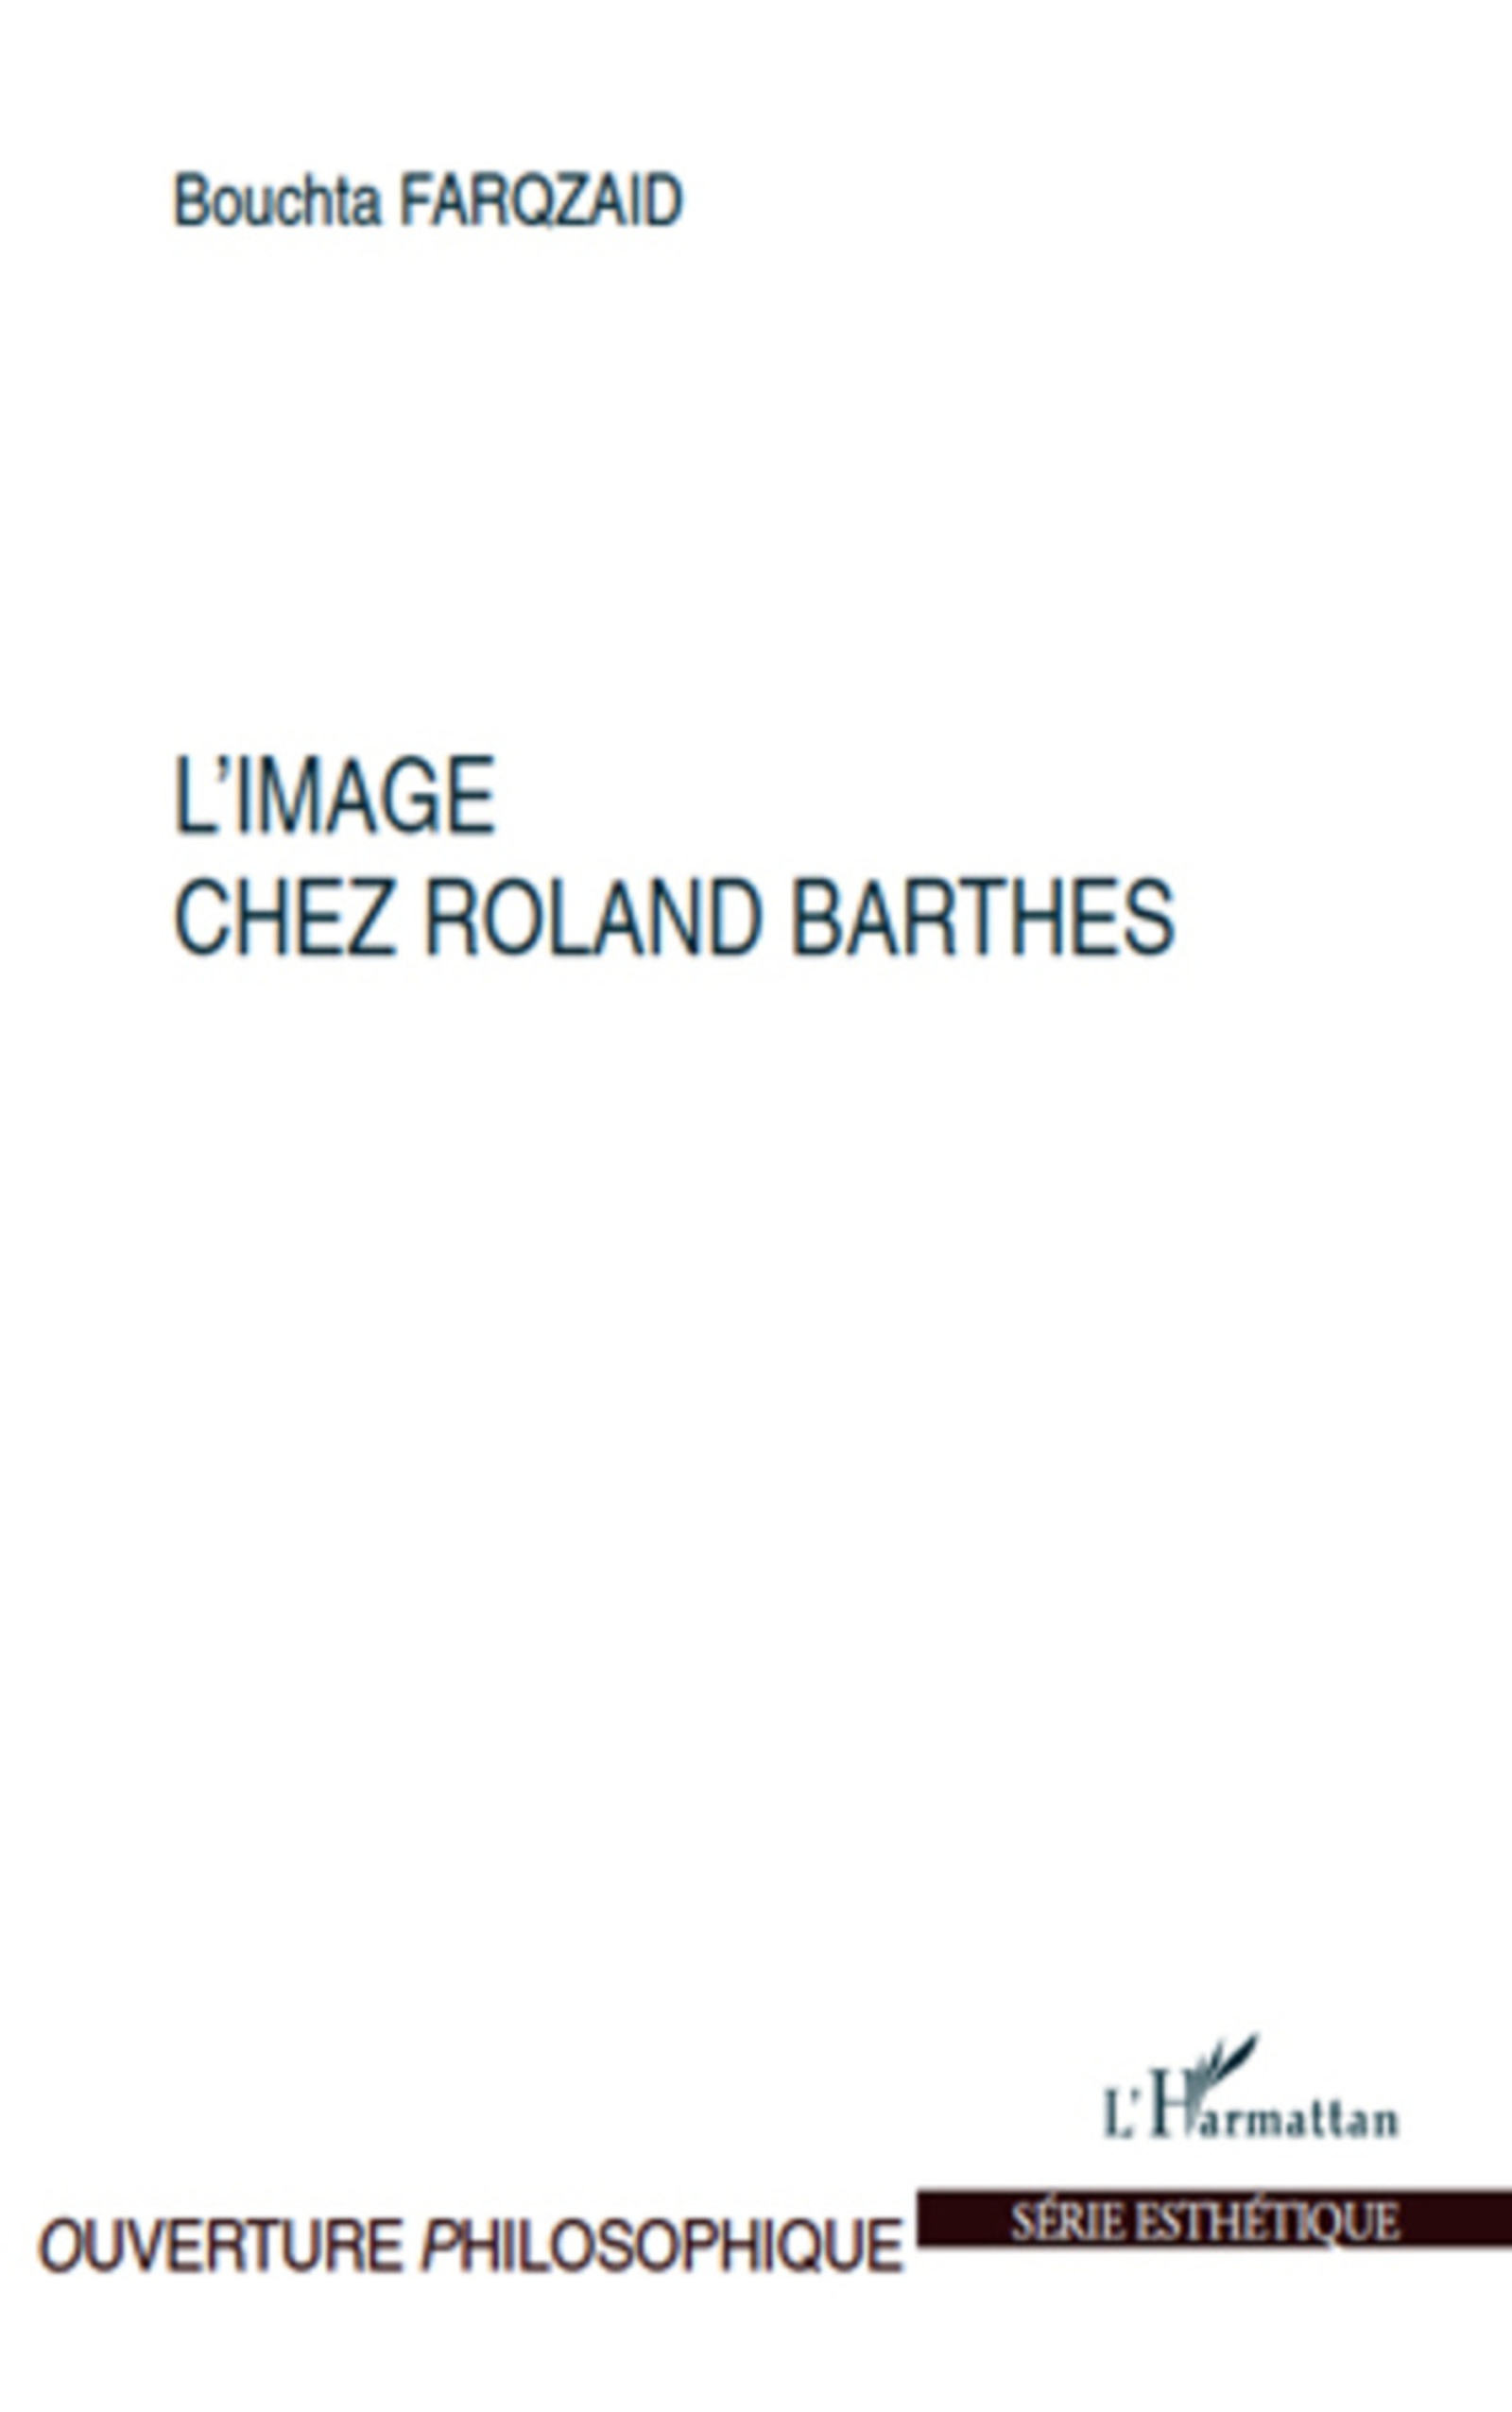 Ebook image chez roland barthes de bouchta farqzaid for Chambre claire roland barthes